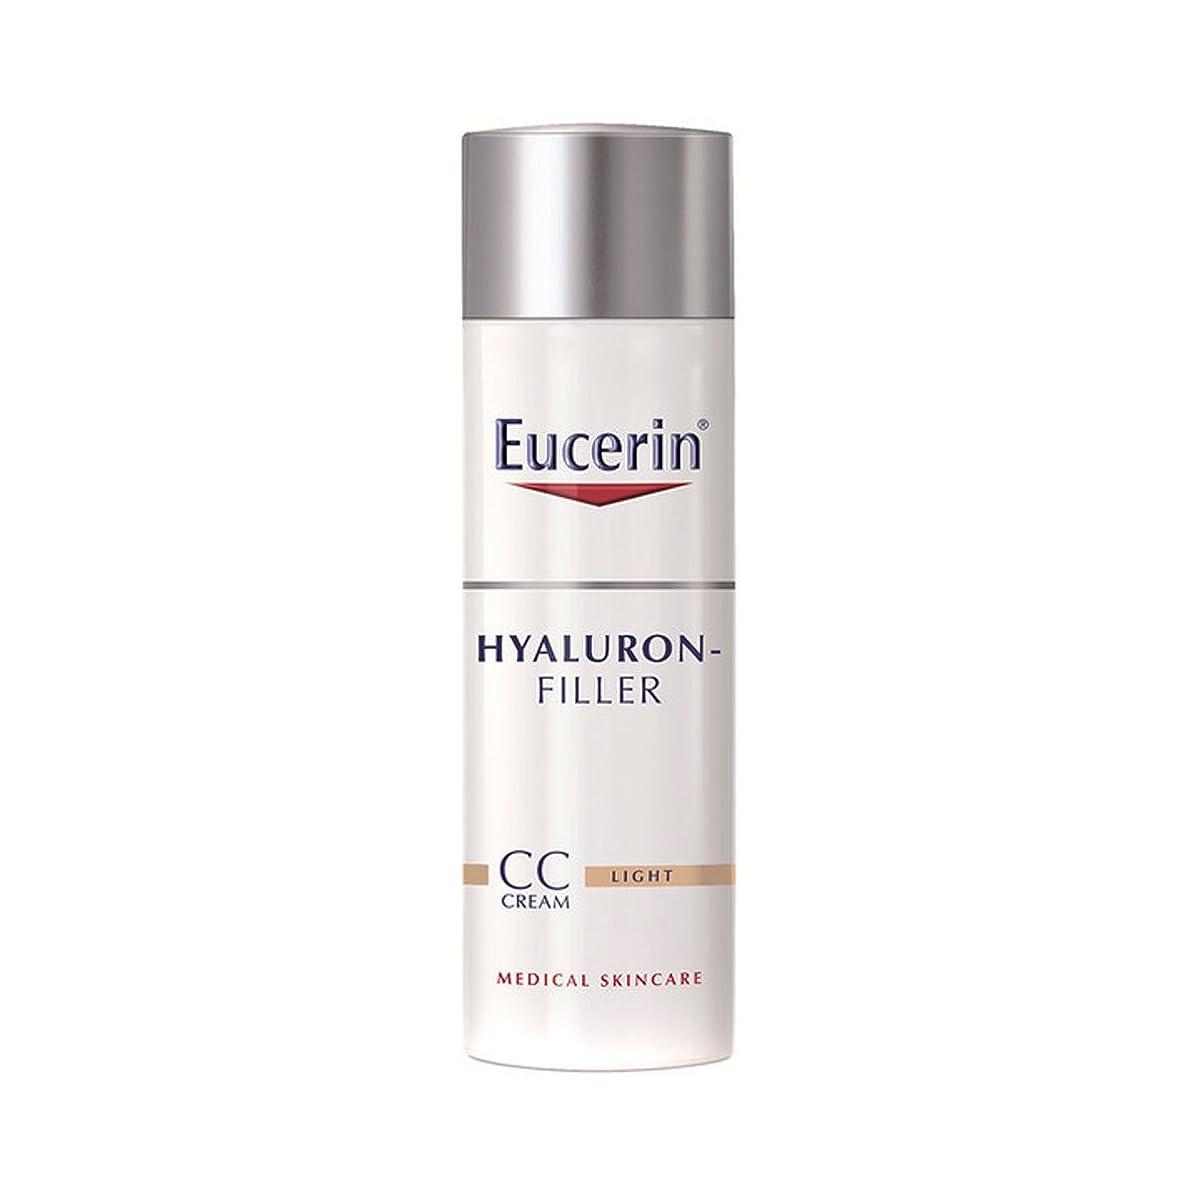 外部加害者奴隷Eucerin Hyaluron-filler Cc Cream Light 50ml [並行輸入品]